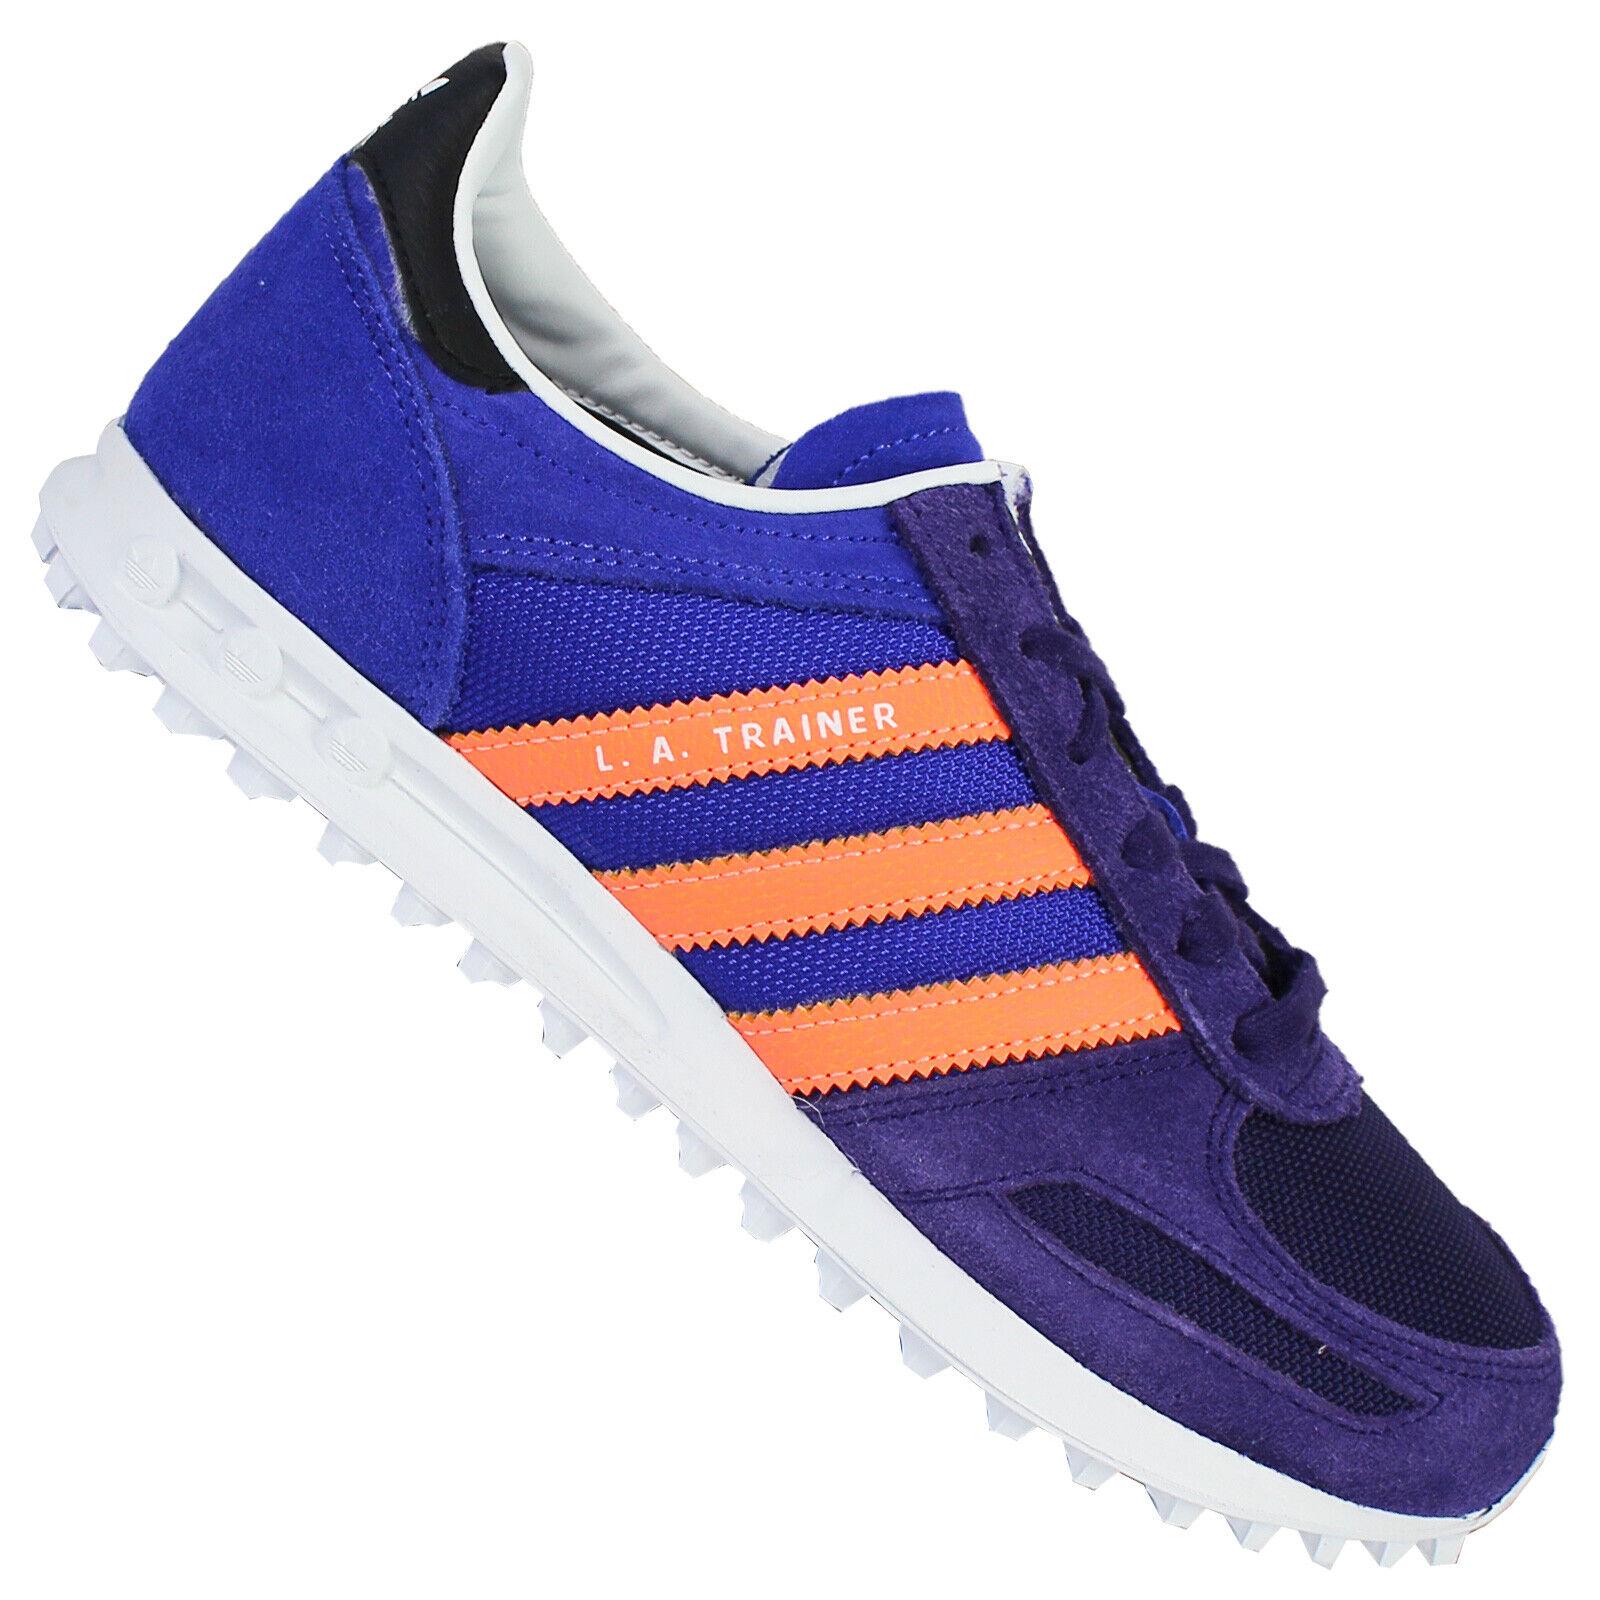 Tempo schuhe damen Turnschuhe Vettura Originals Adidas